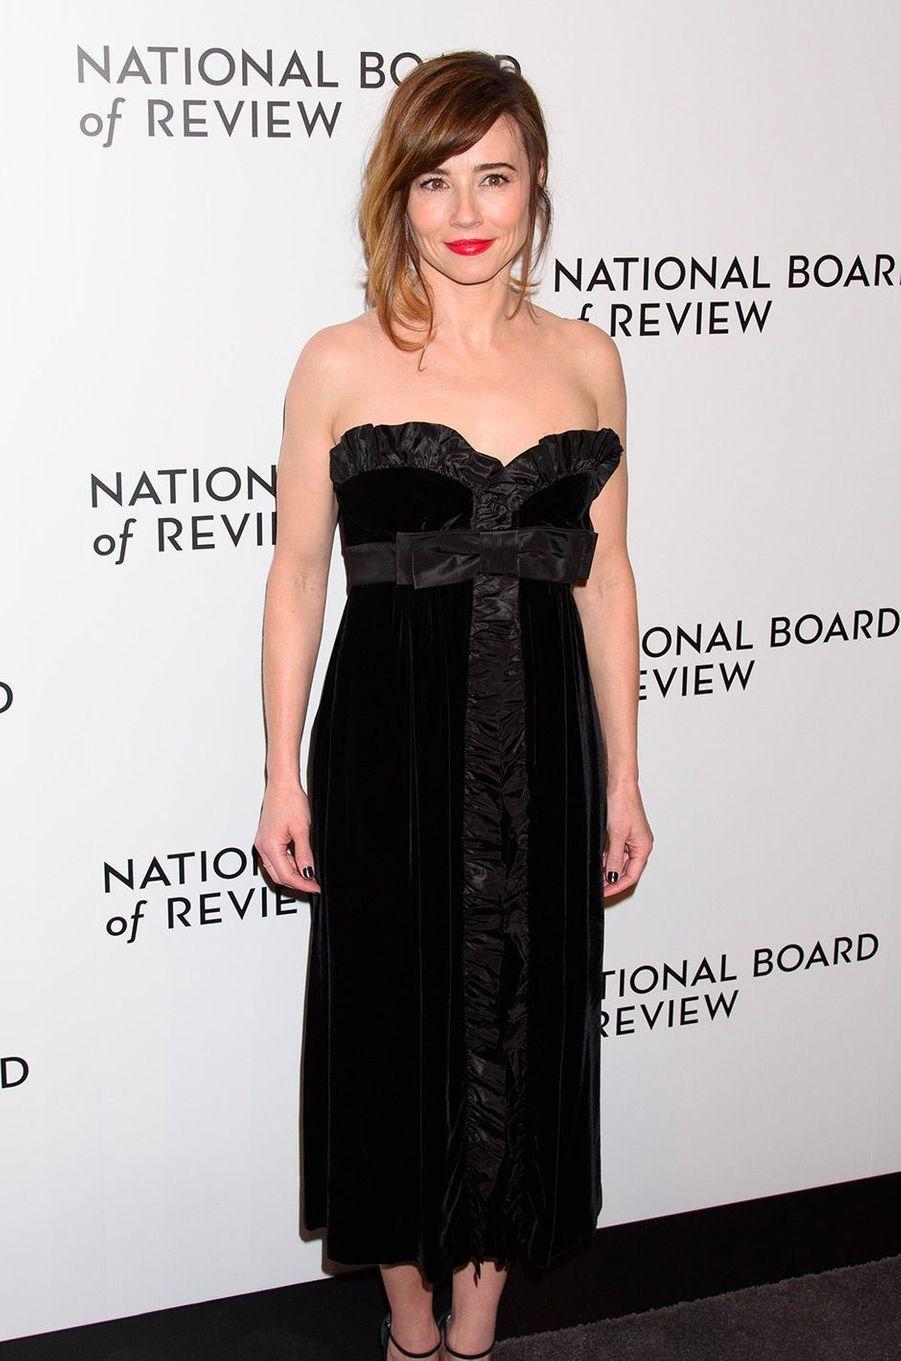 Linda Cardellini au National Board of Review Gala, mardi 8 janvier, à New York